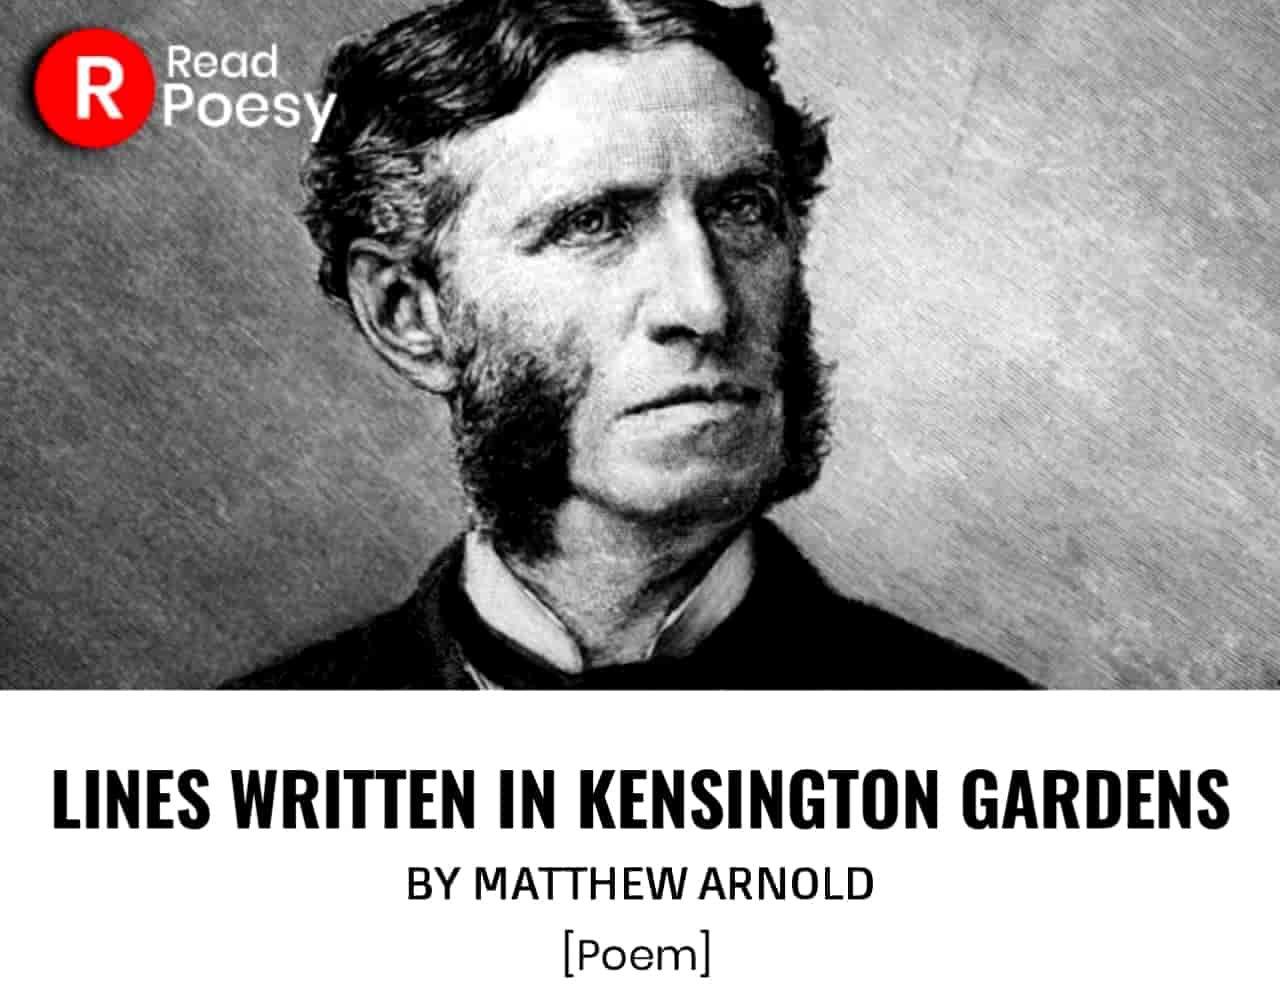 6c32800277e781a63f2875289b3c6861 - Matthew Arnold Lines Written In Kensington Gardens